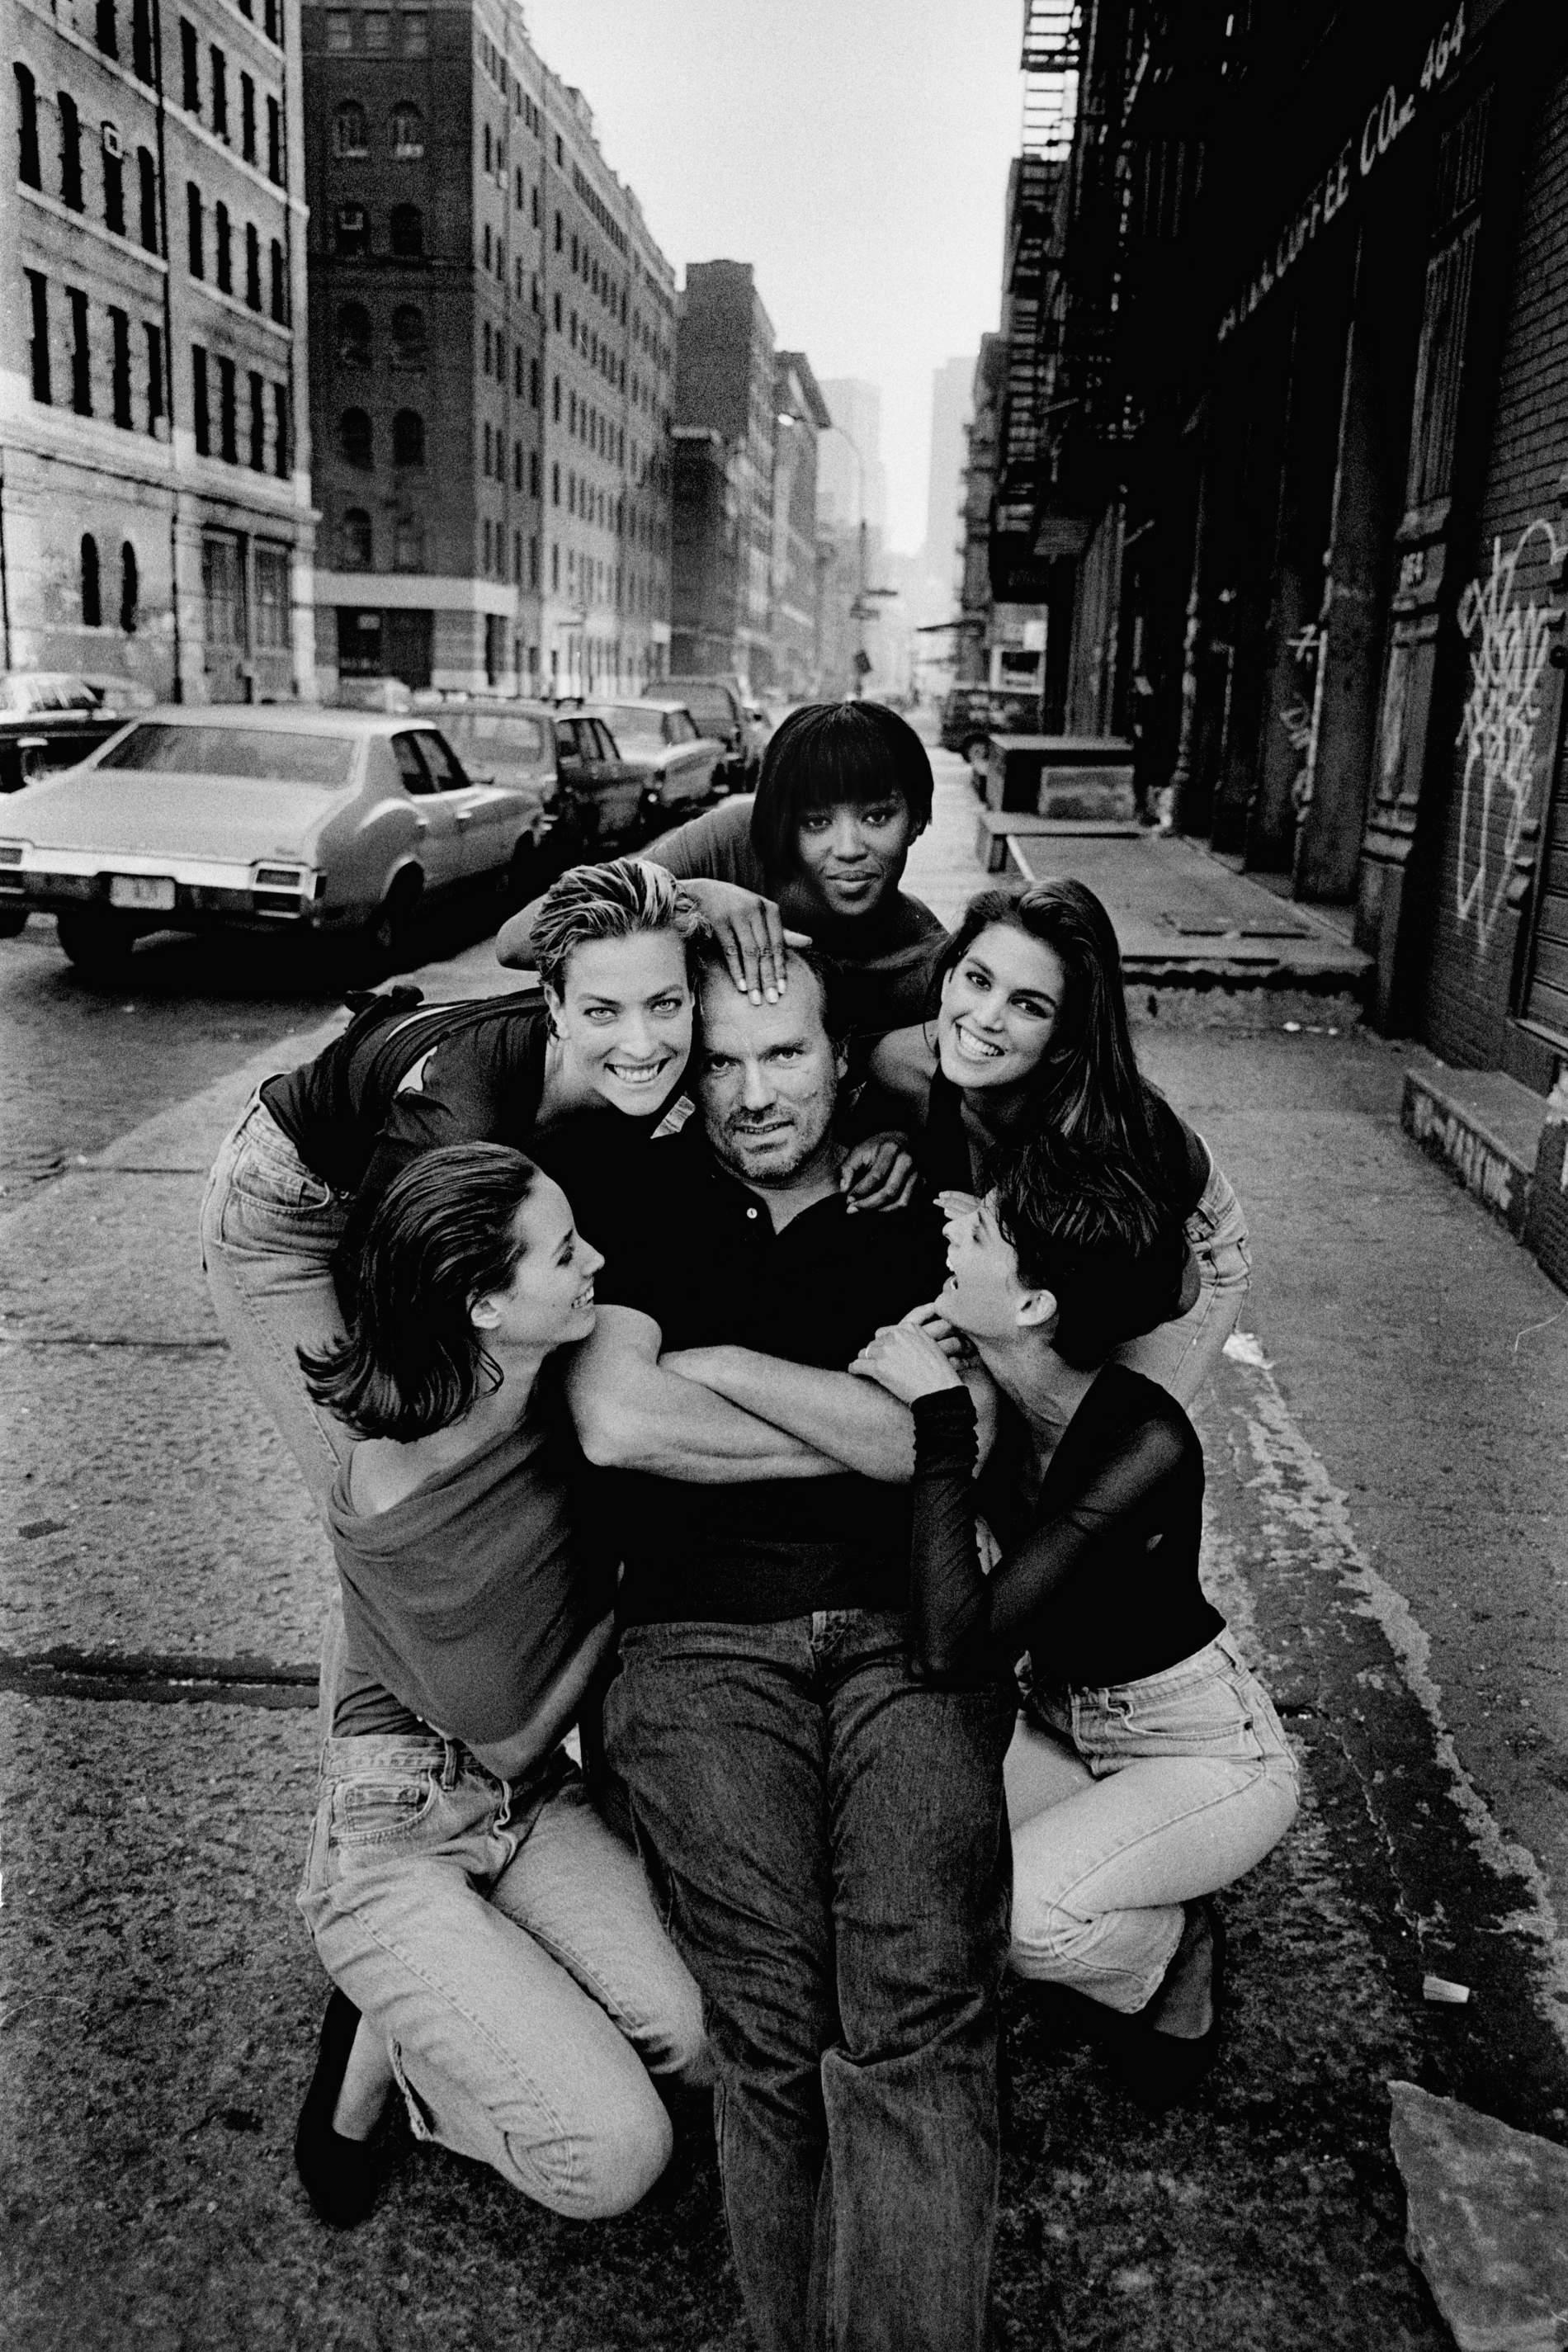 Peter Lindbergh az ikonikus modellcsapattal 1992-ben